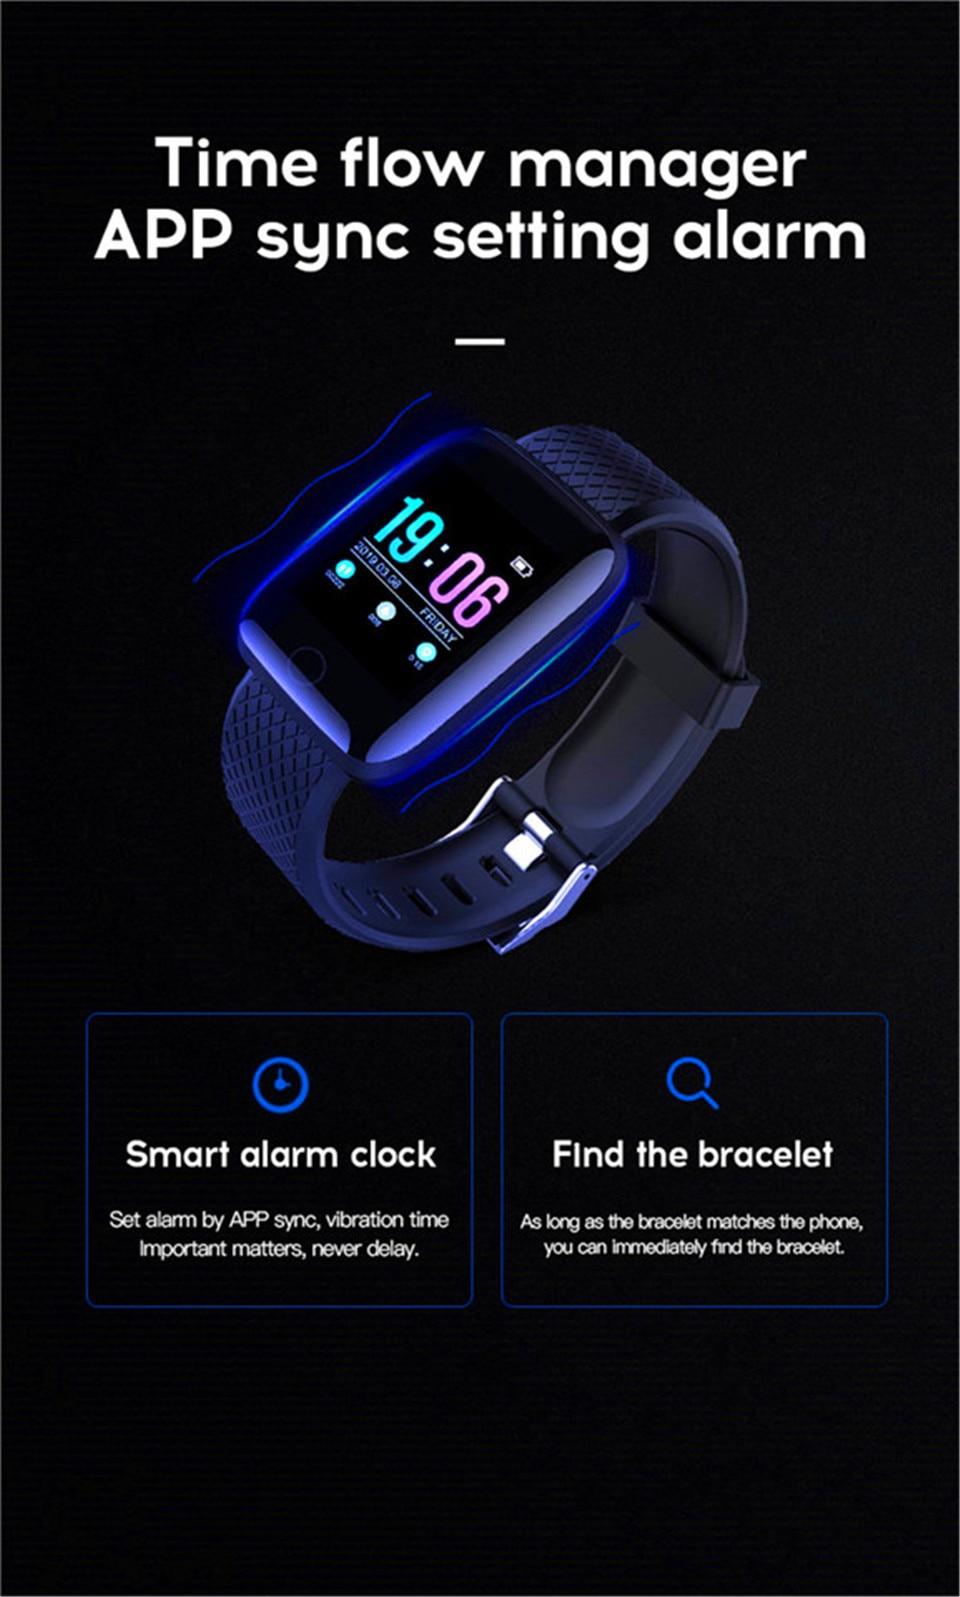 HTB1UHruO6TpK1RjSZKPq6y3UpXaL Smart Wristband Heart Rate Monitor Smart Fitness Bracelet Blood Pressure Waterproof IP67 Fitness Tracker Watch For Women Men